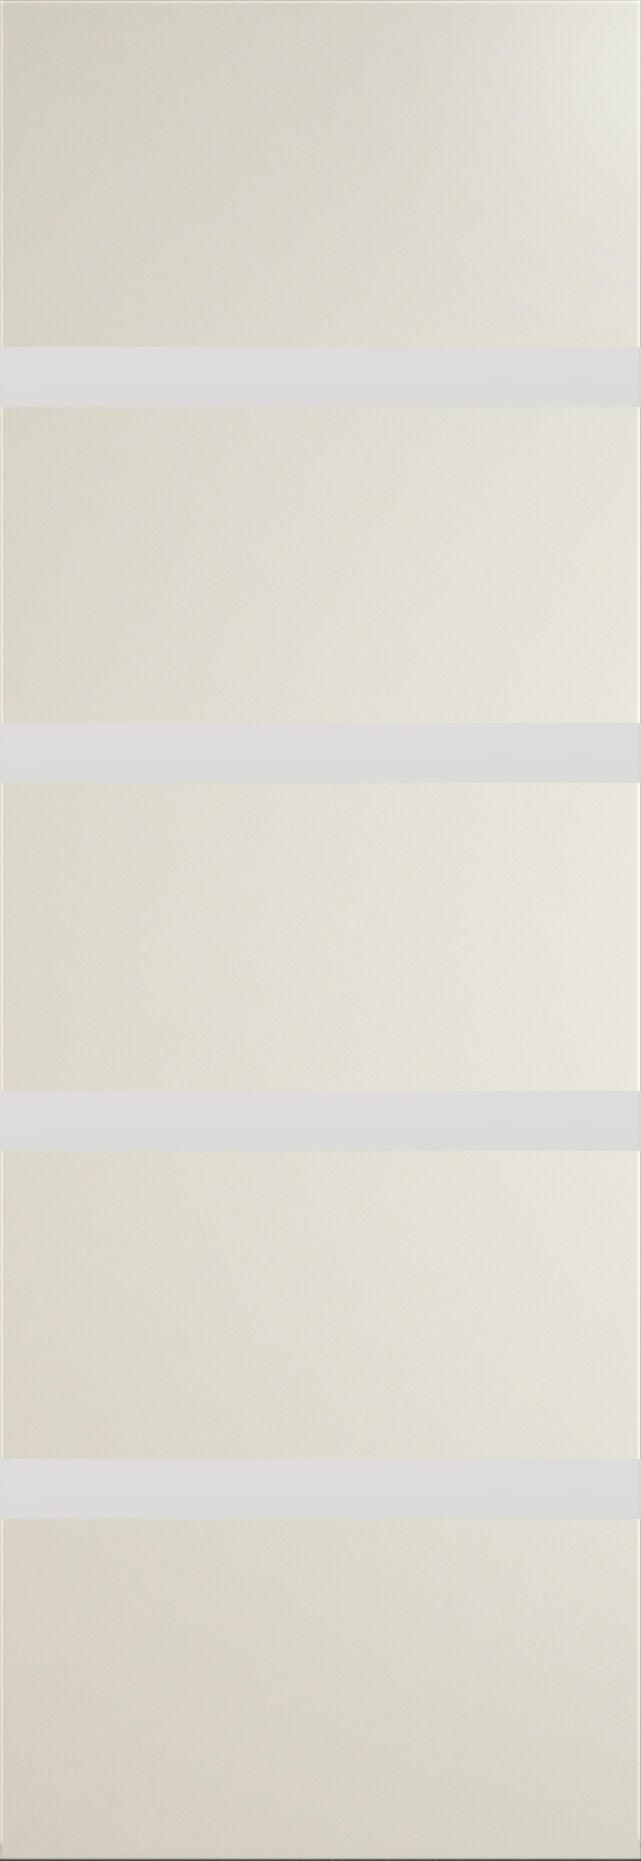 Tivoli Д-4 Invisible цвет - Жемчужная эмаль Без стекла (ДГ)